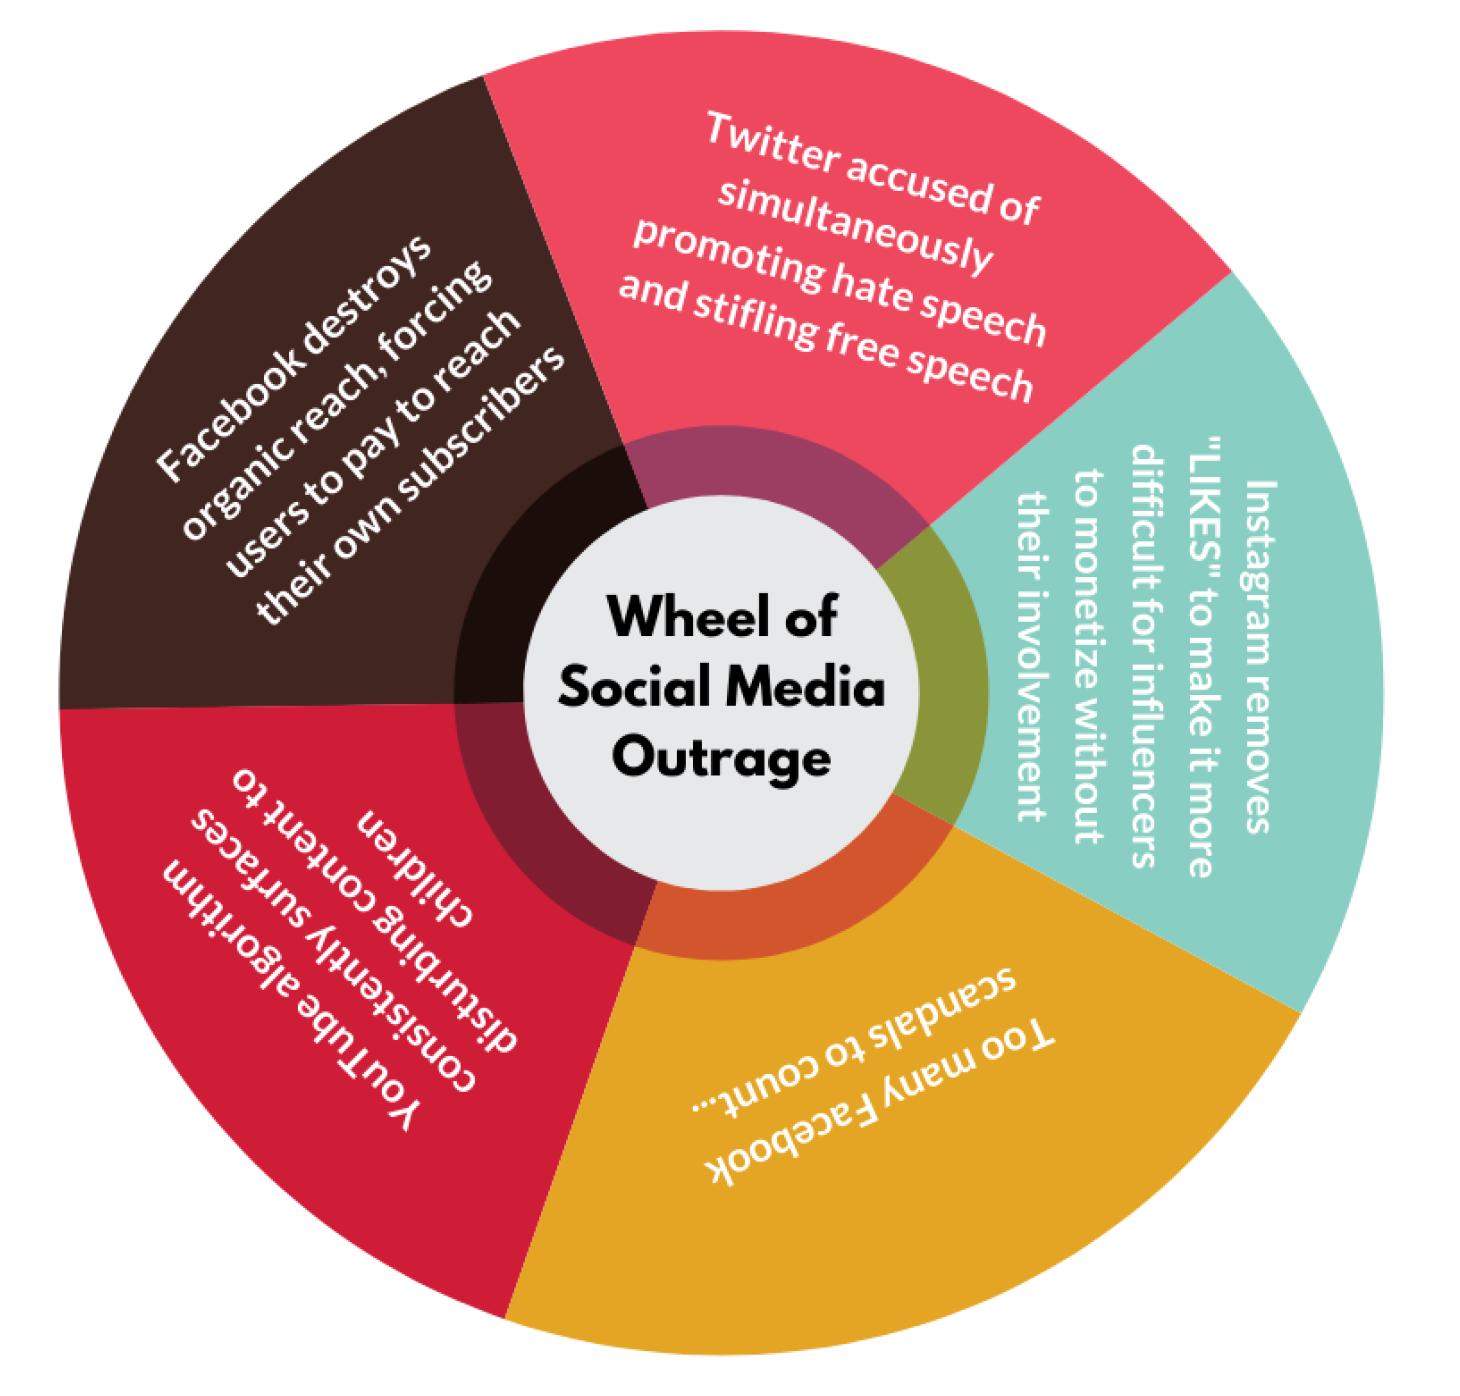 wheel of social media outrage